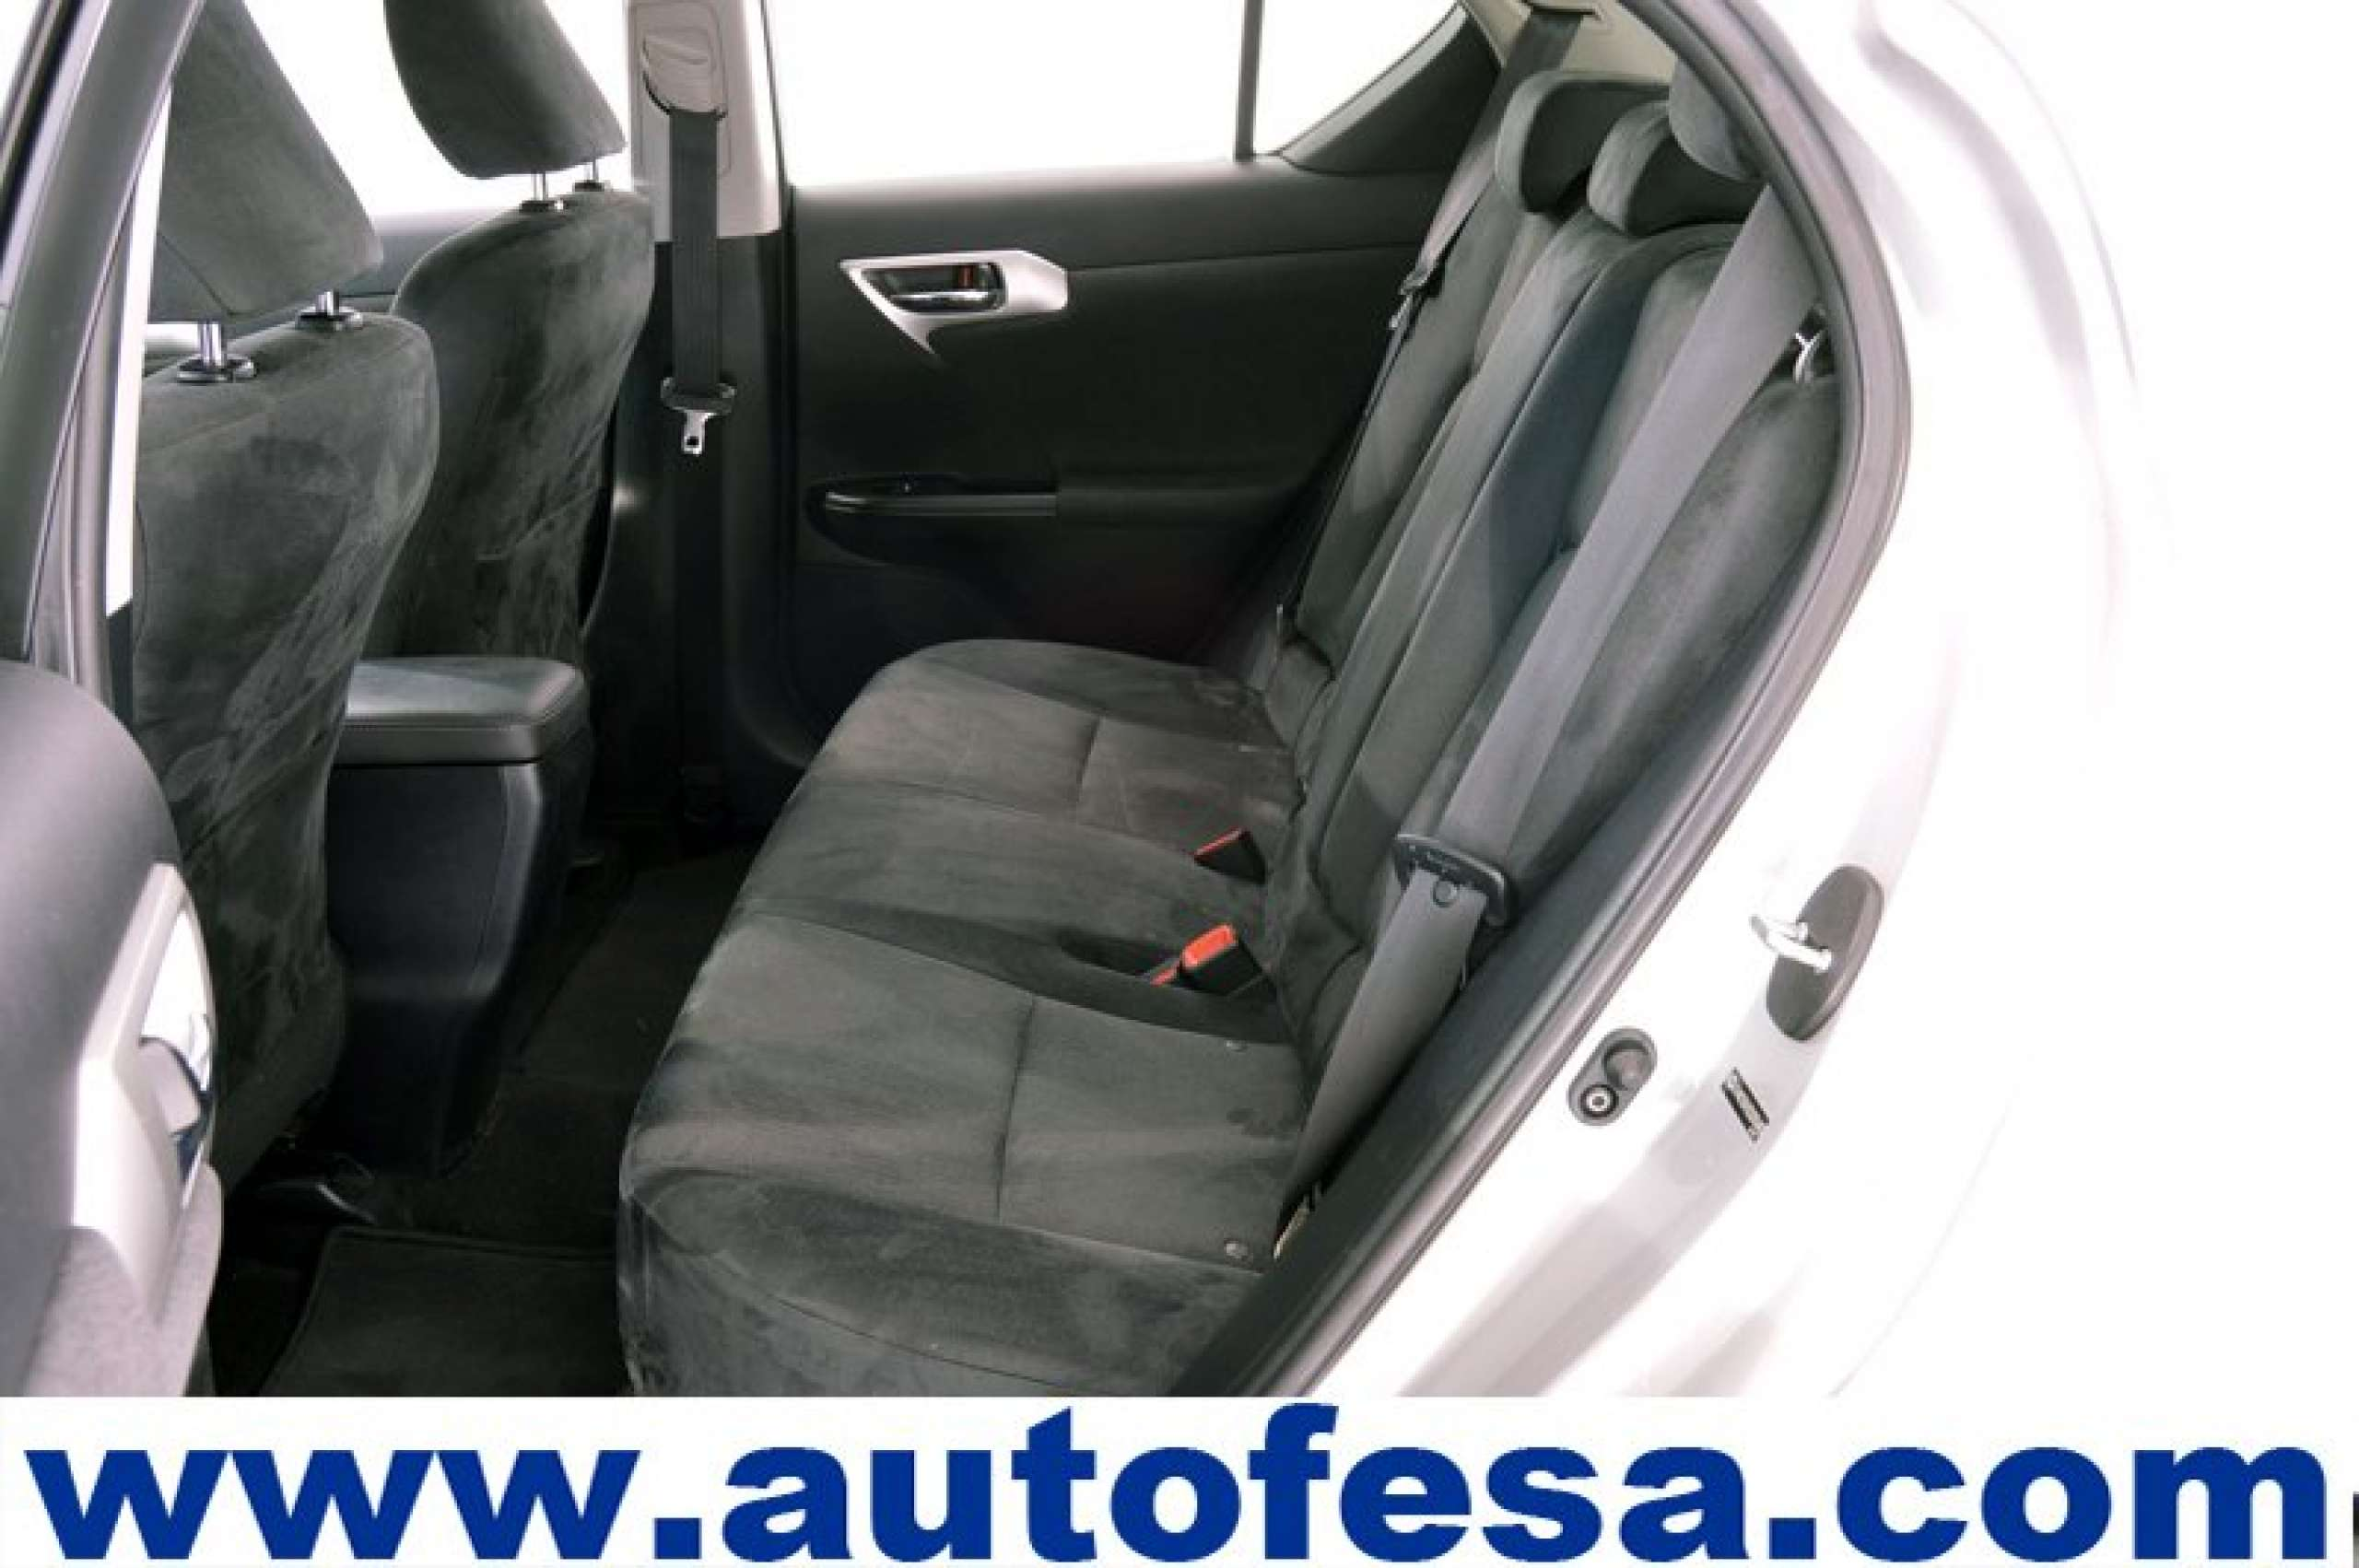 Lexus Ct 200h 1.8 136cv Eco Auto 5p - Foto 29